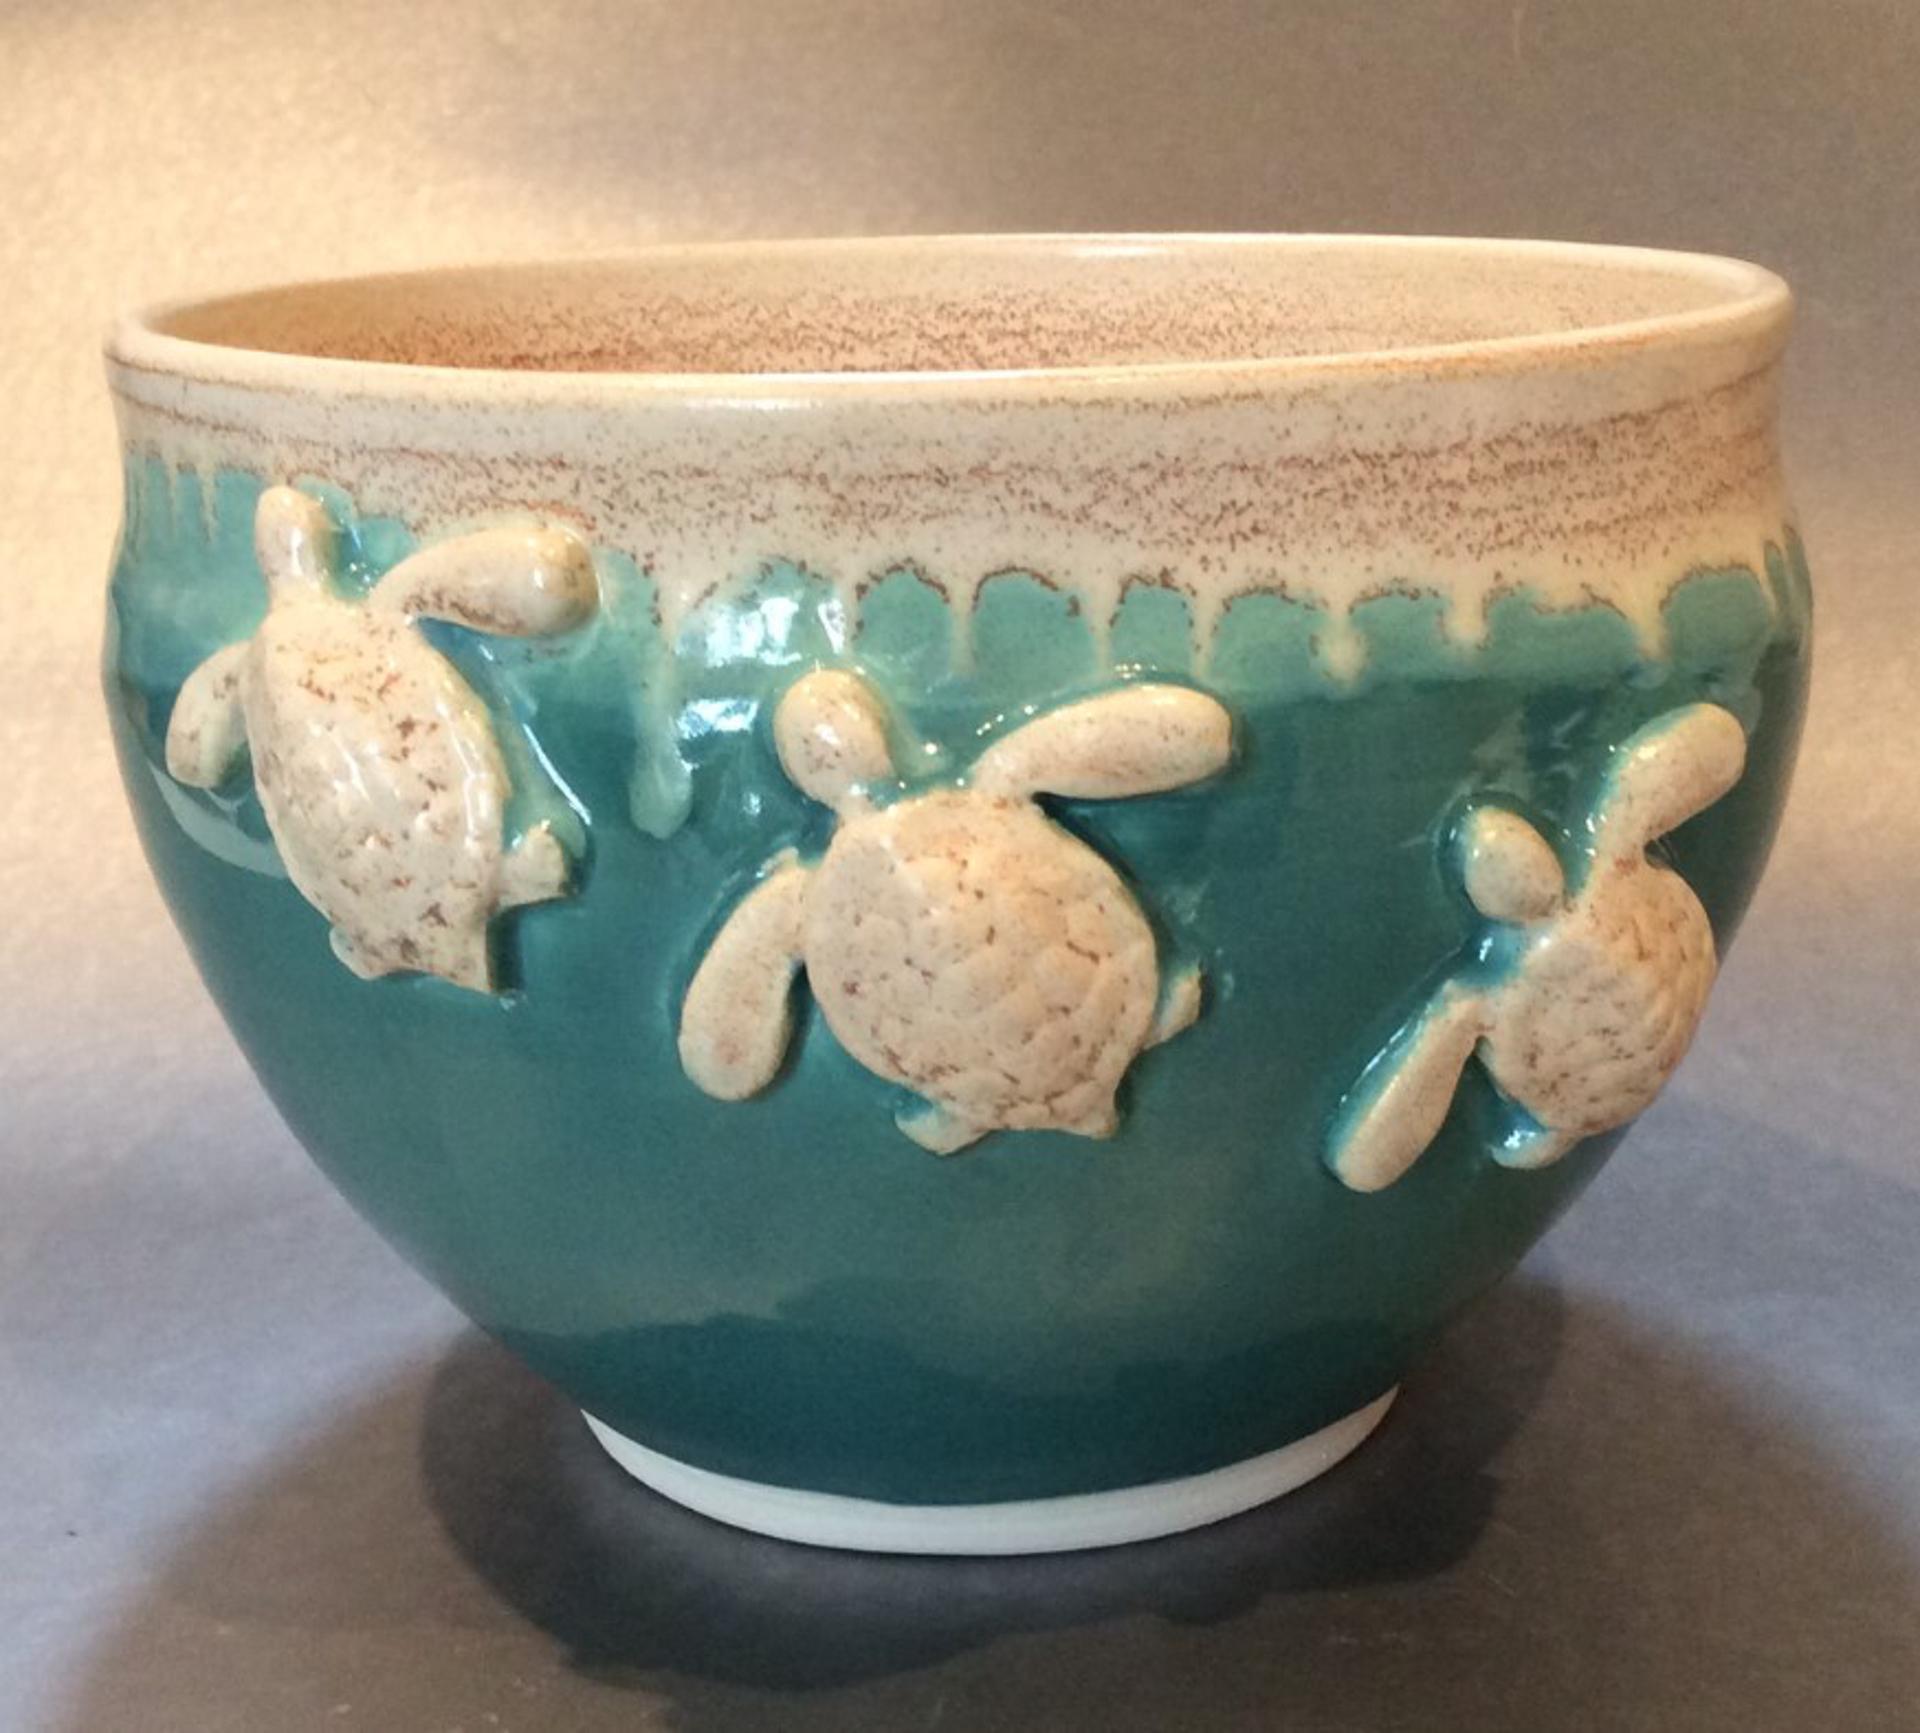 Turquoise bowl with turtles by Ilene Olanoff